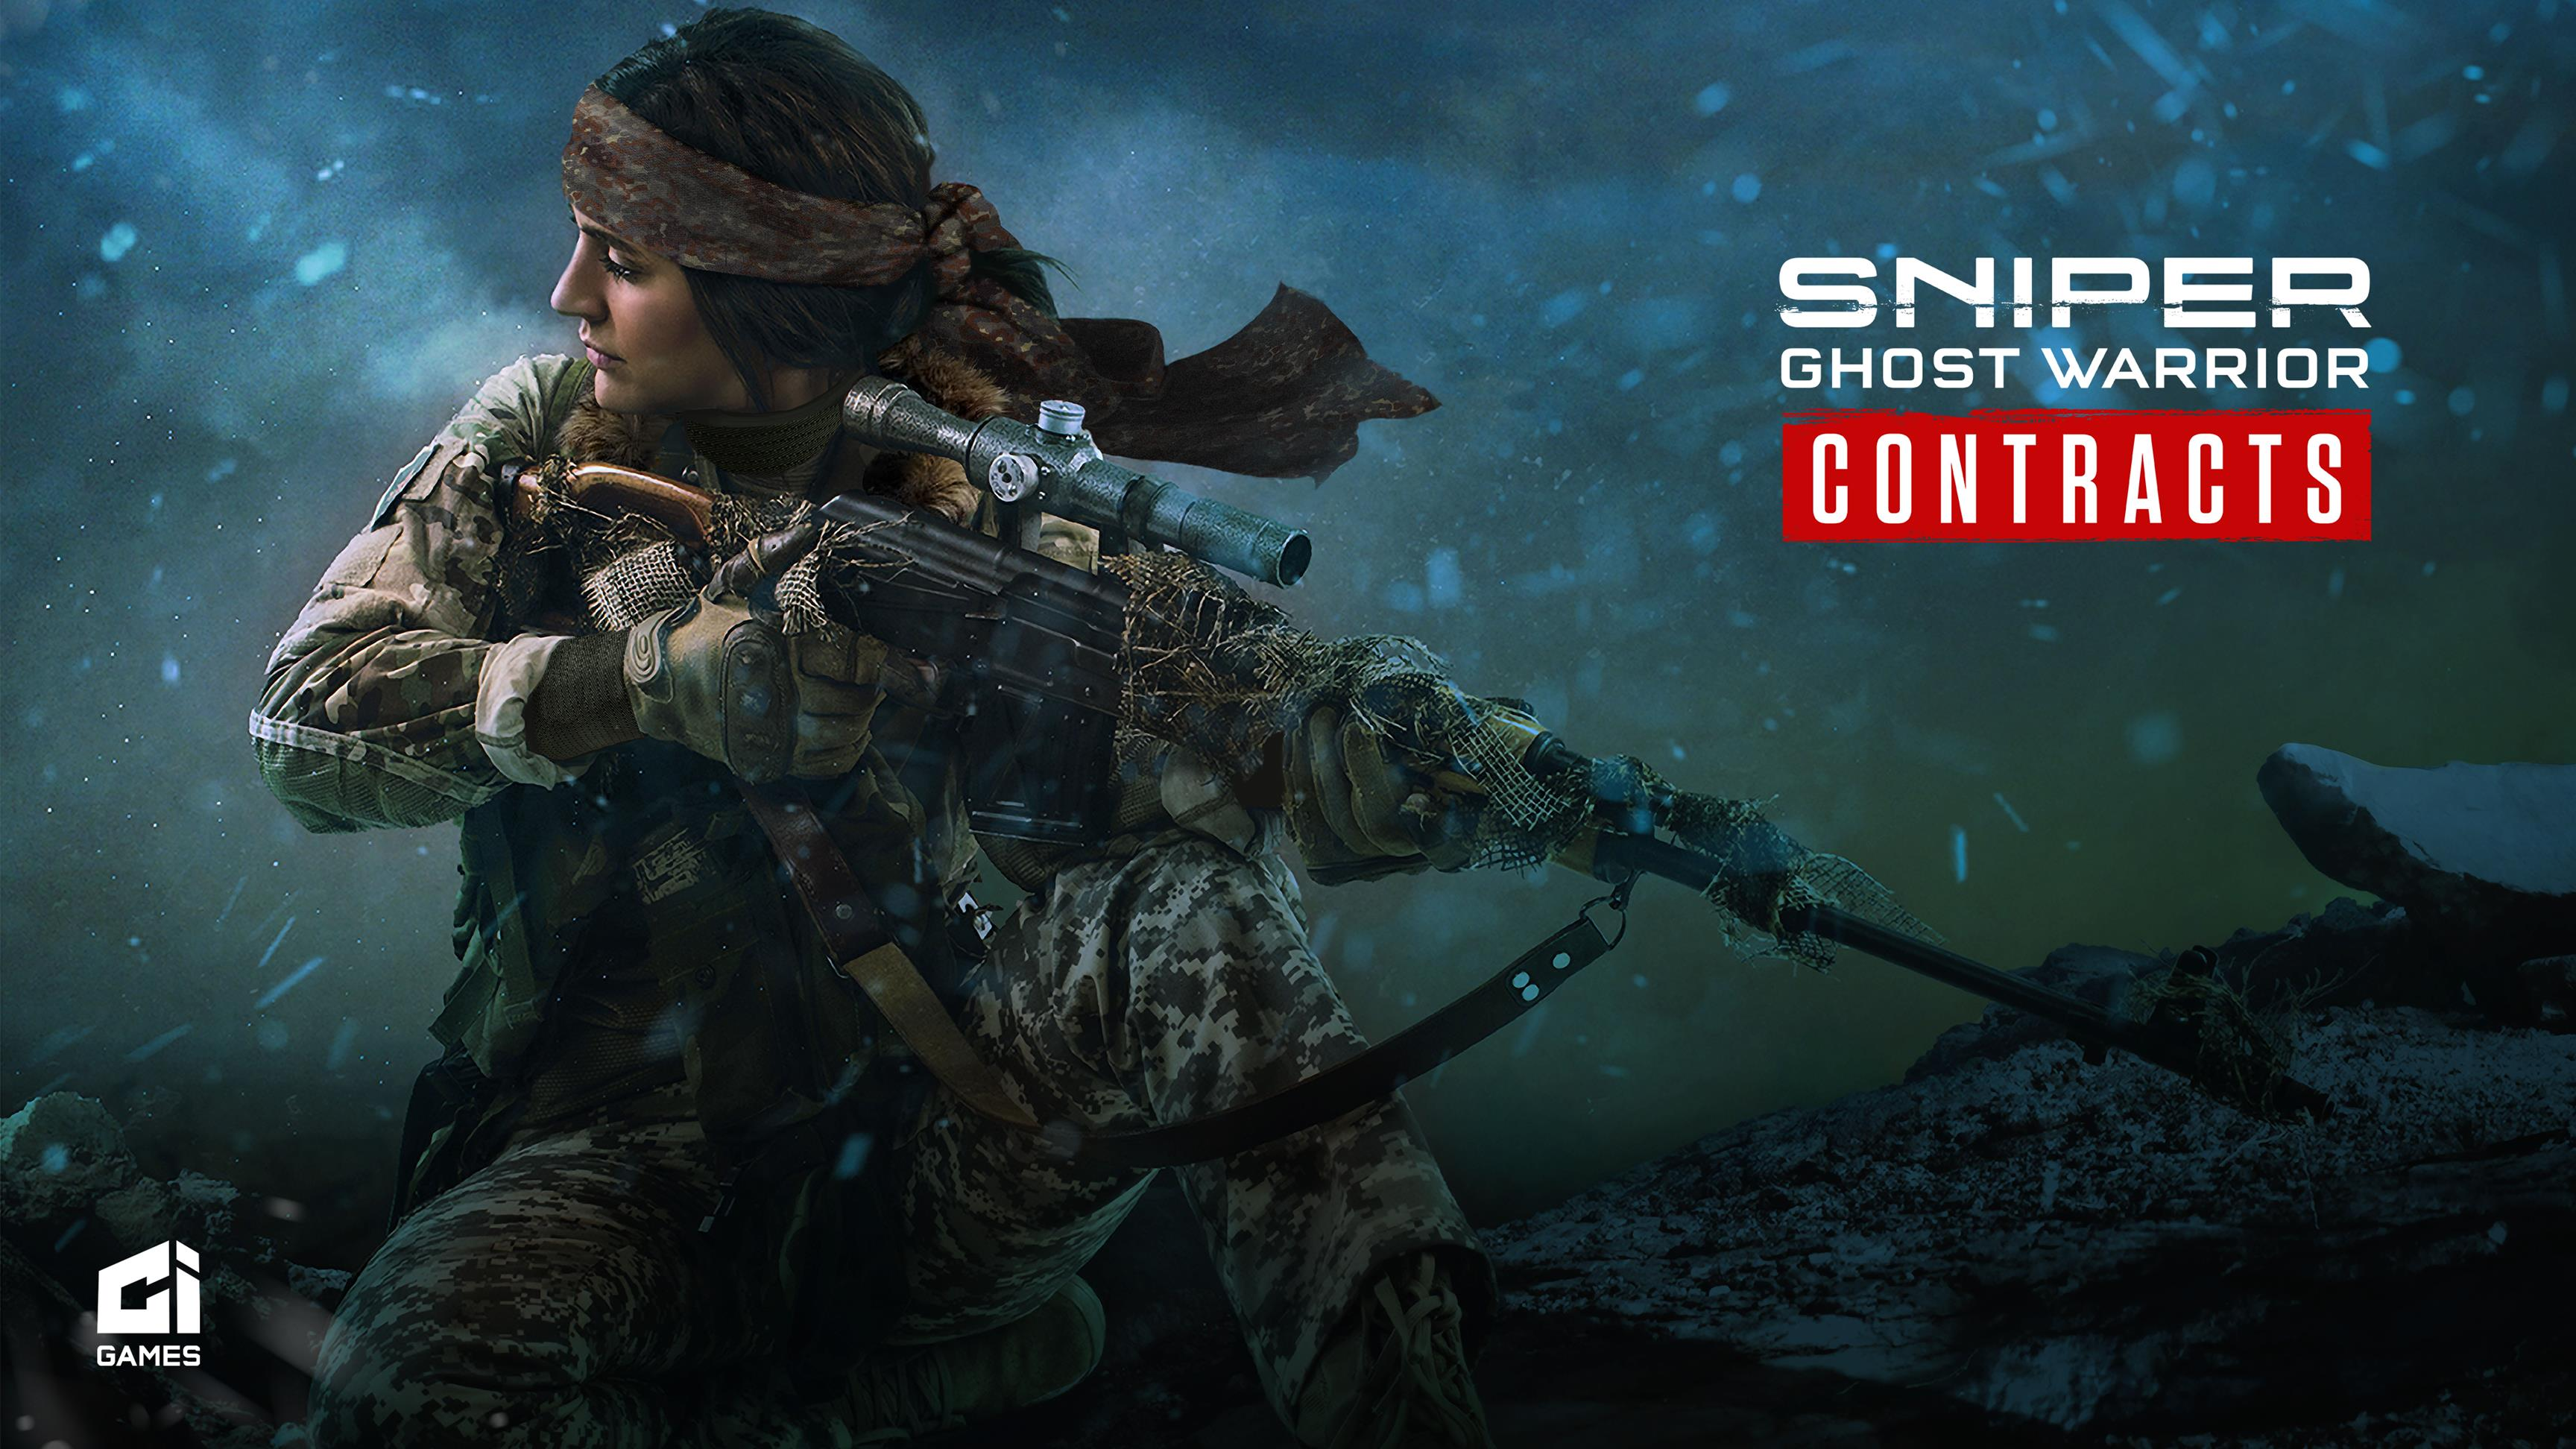 10 minutos de jogabilidade de Sniper Ghost Warrior: Contracts